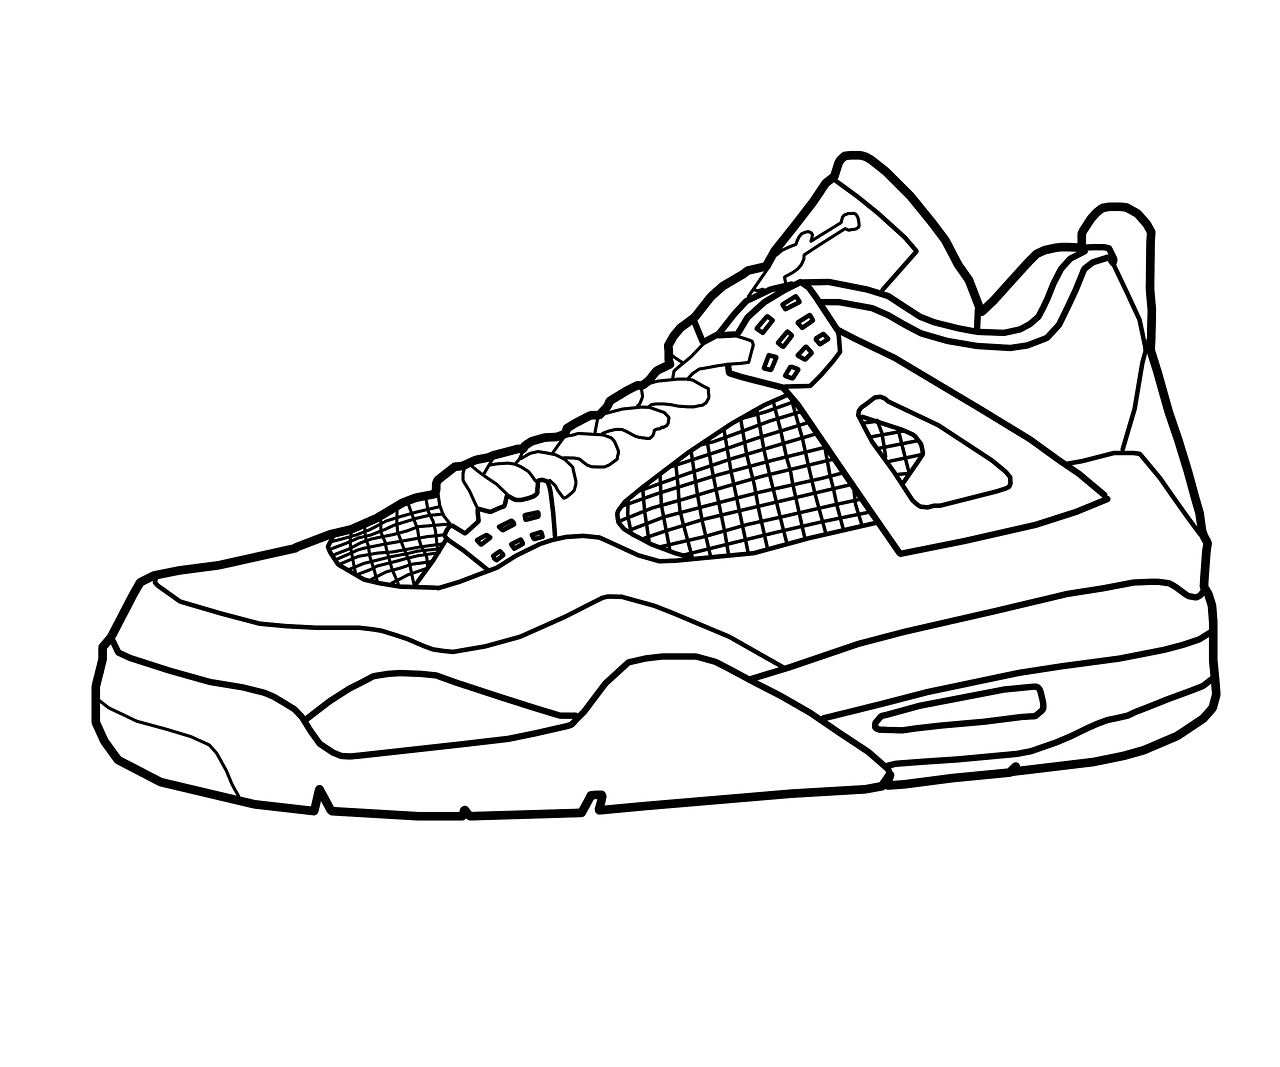 1280x1067 Basketball Coloring Pages Like Jordan Jordan Shoe Coloring Pages